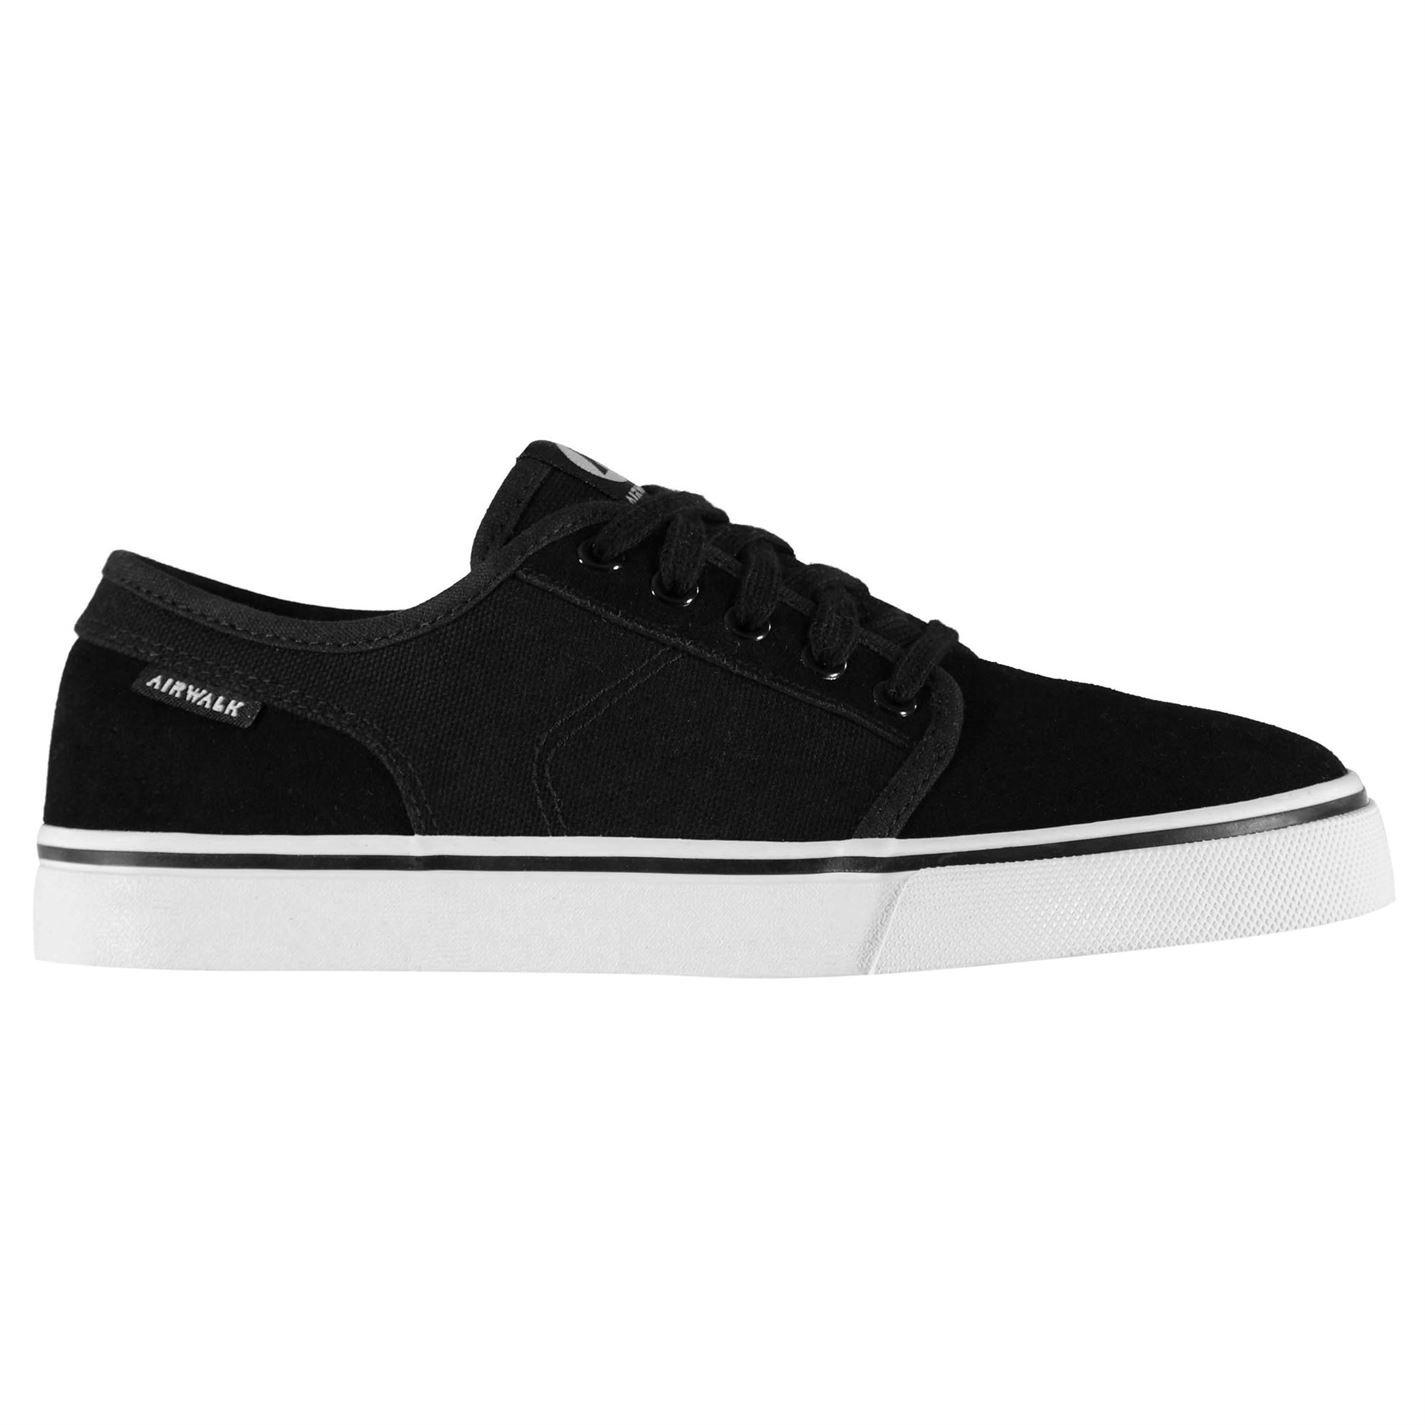 Airwalk Kids Tempo2 Skate Shoes Low Tops Sneakers